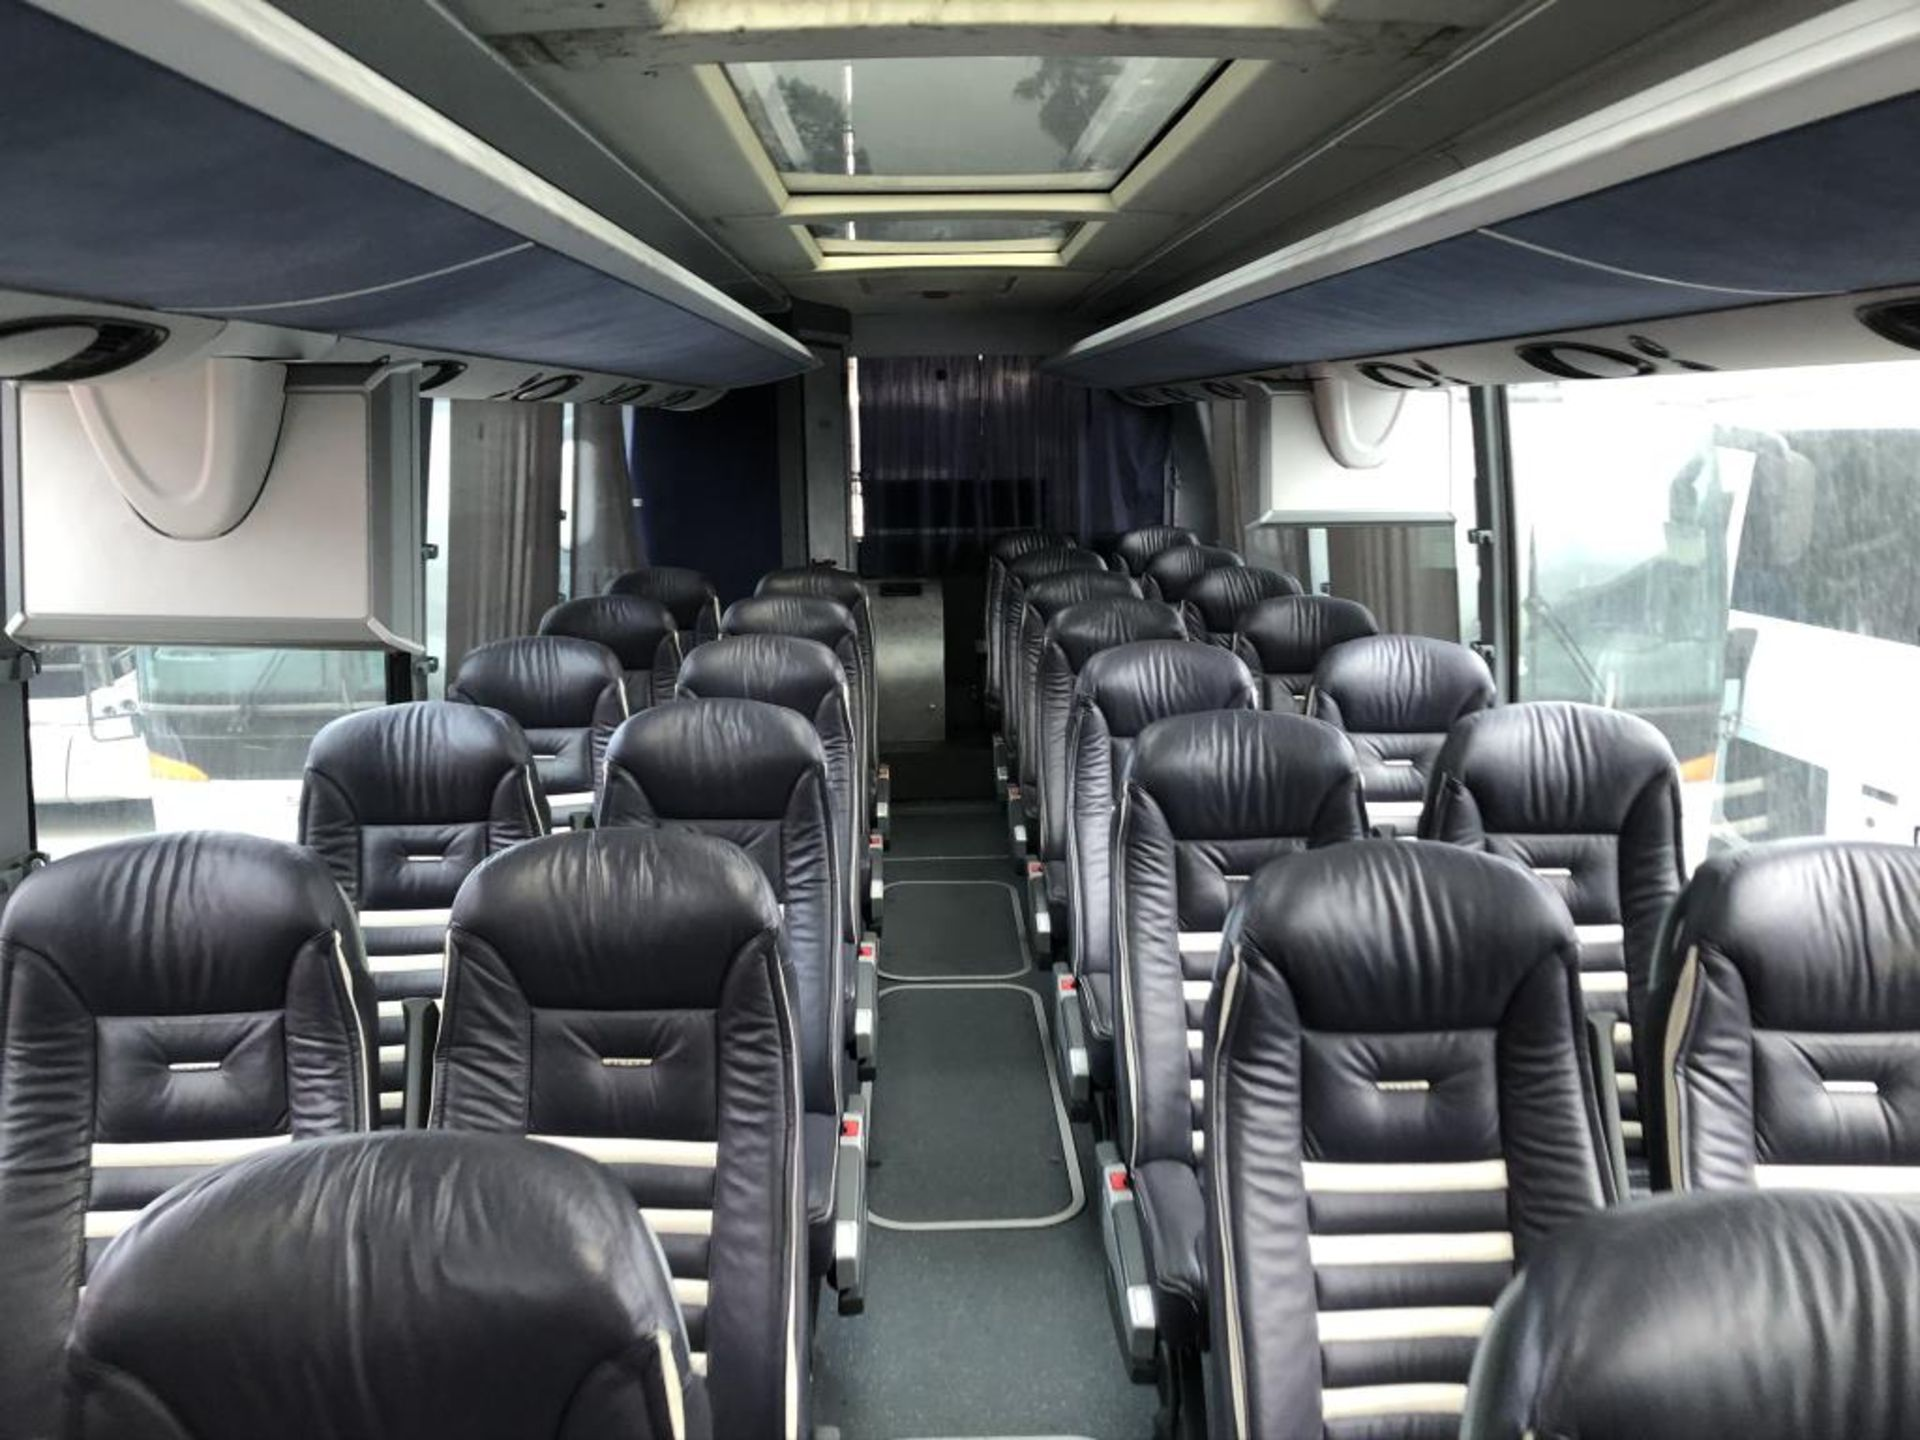 Motor Coach - Image 11 of 18